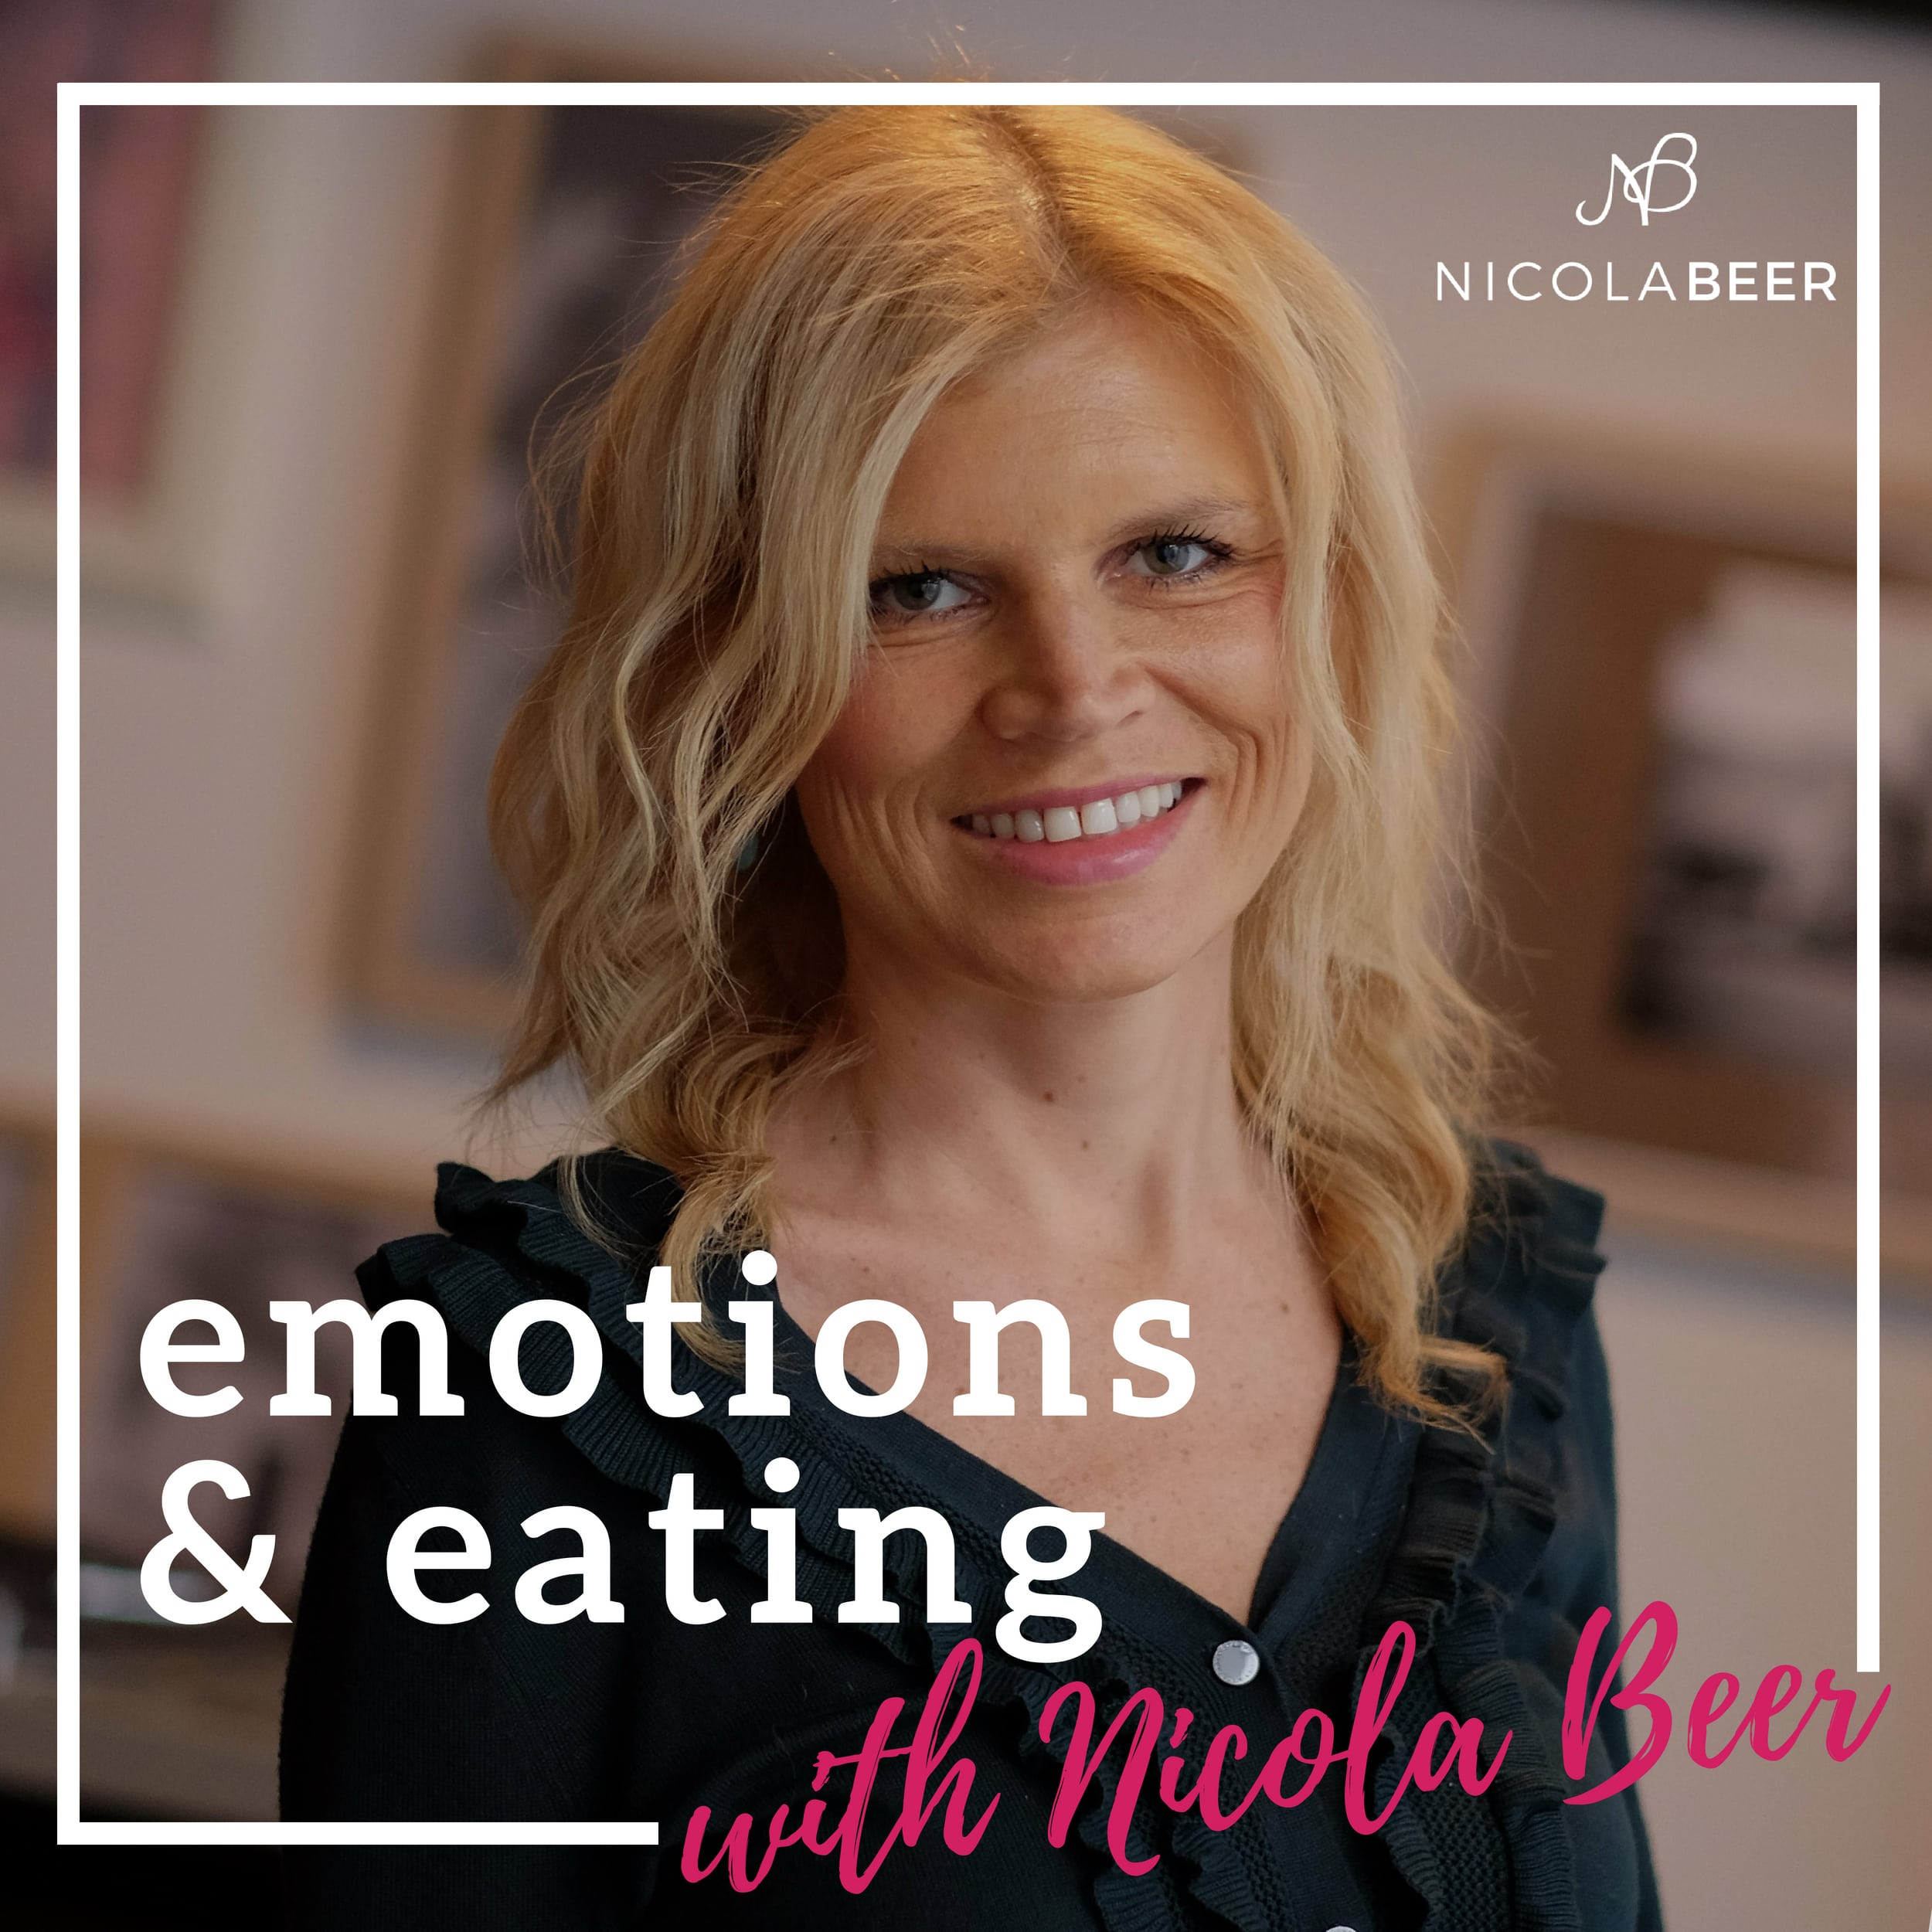 Emotions & Eating with Nicola Beer